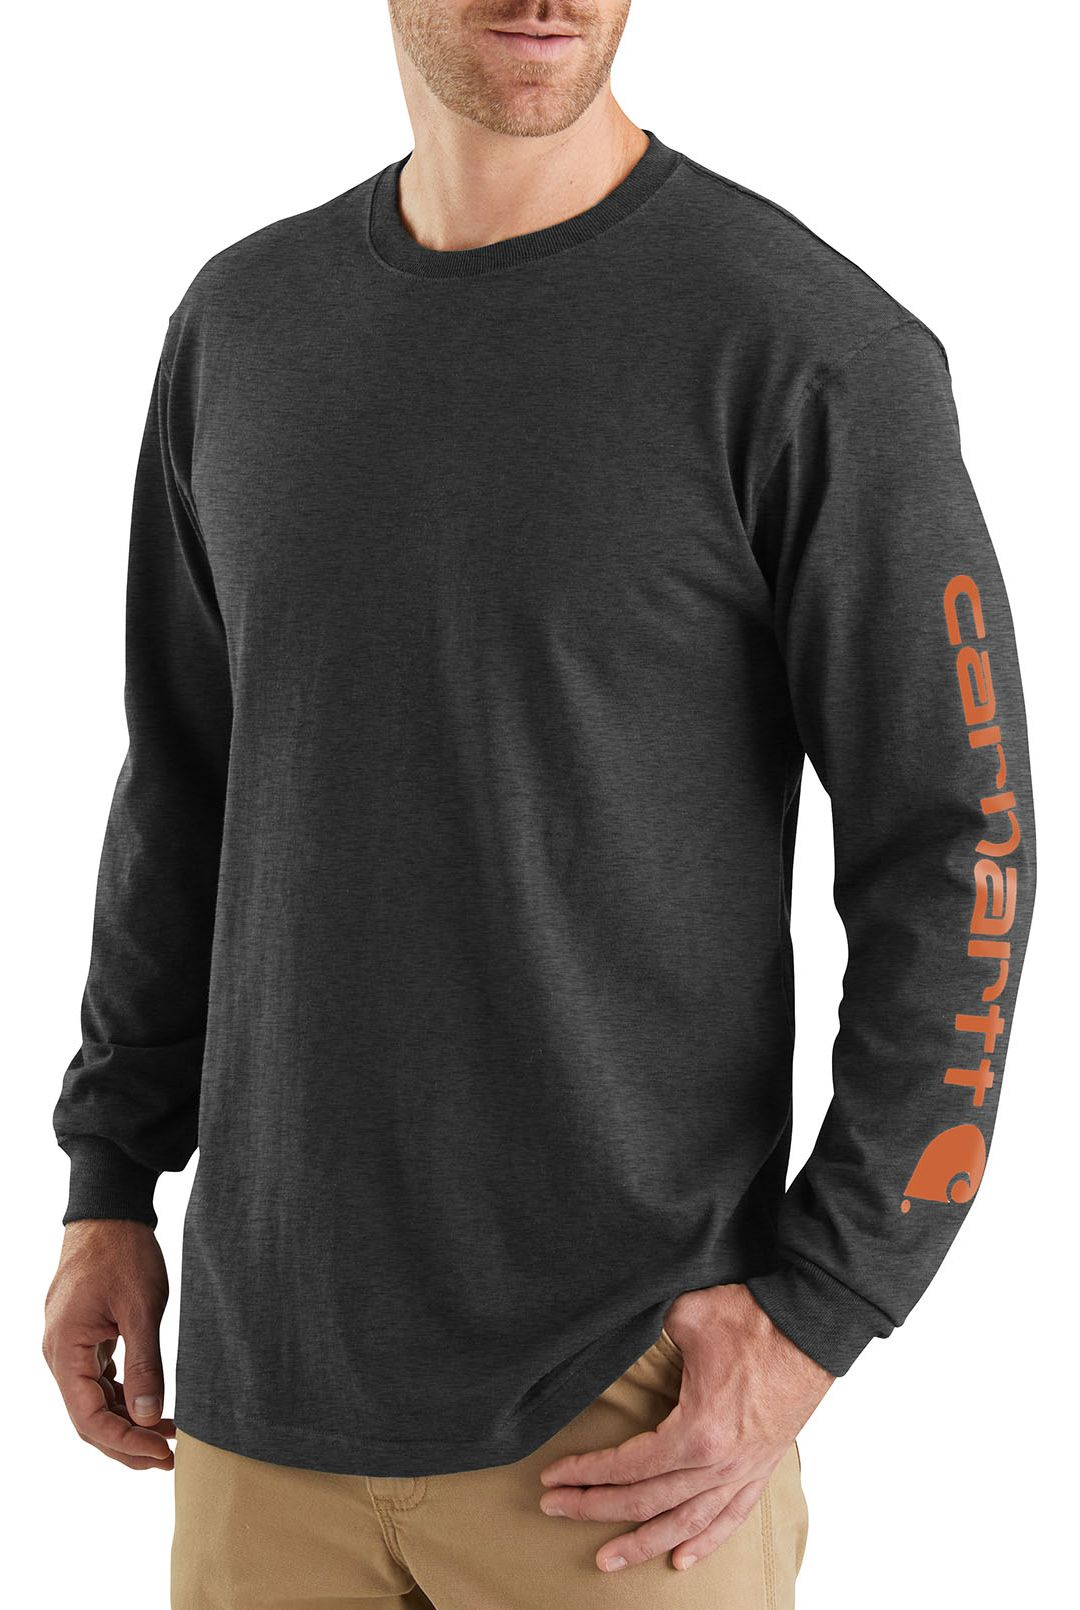 ab0eb6c82 Carhartt Men's Graphic Logo Long Sleeve Shirt | Field & Stream